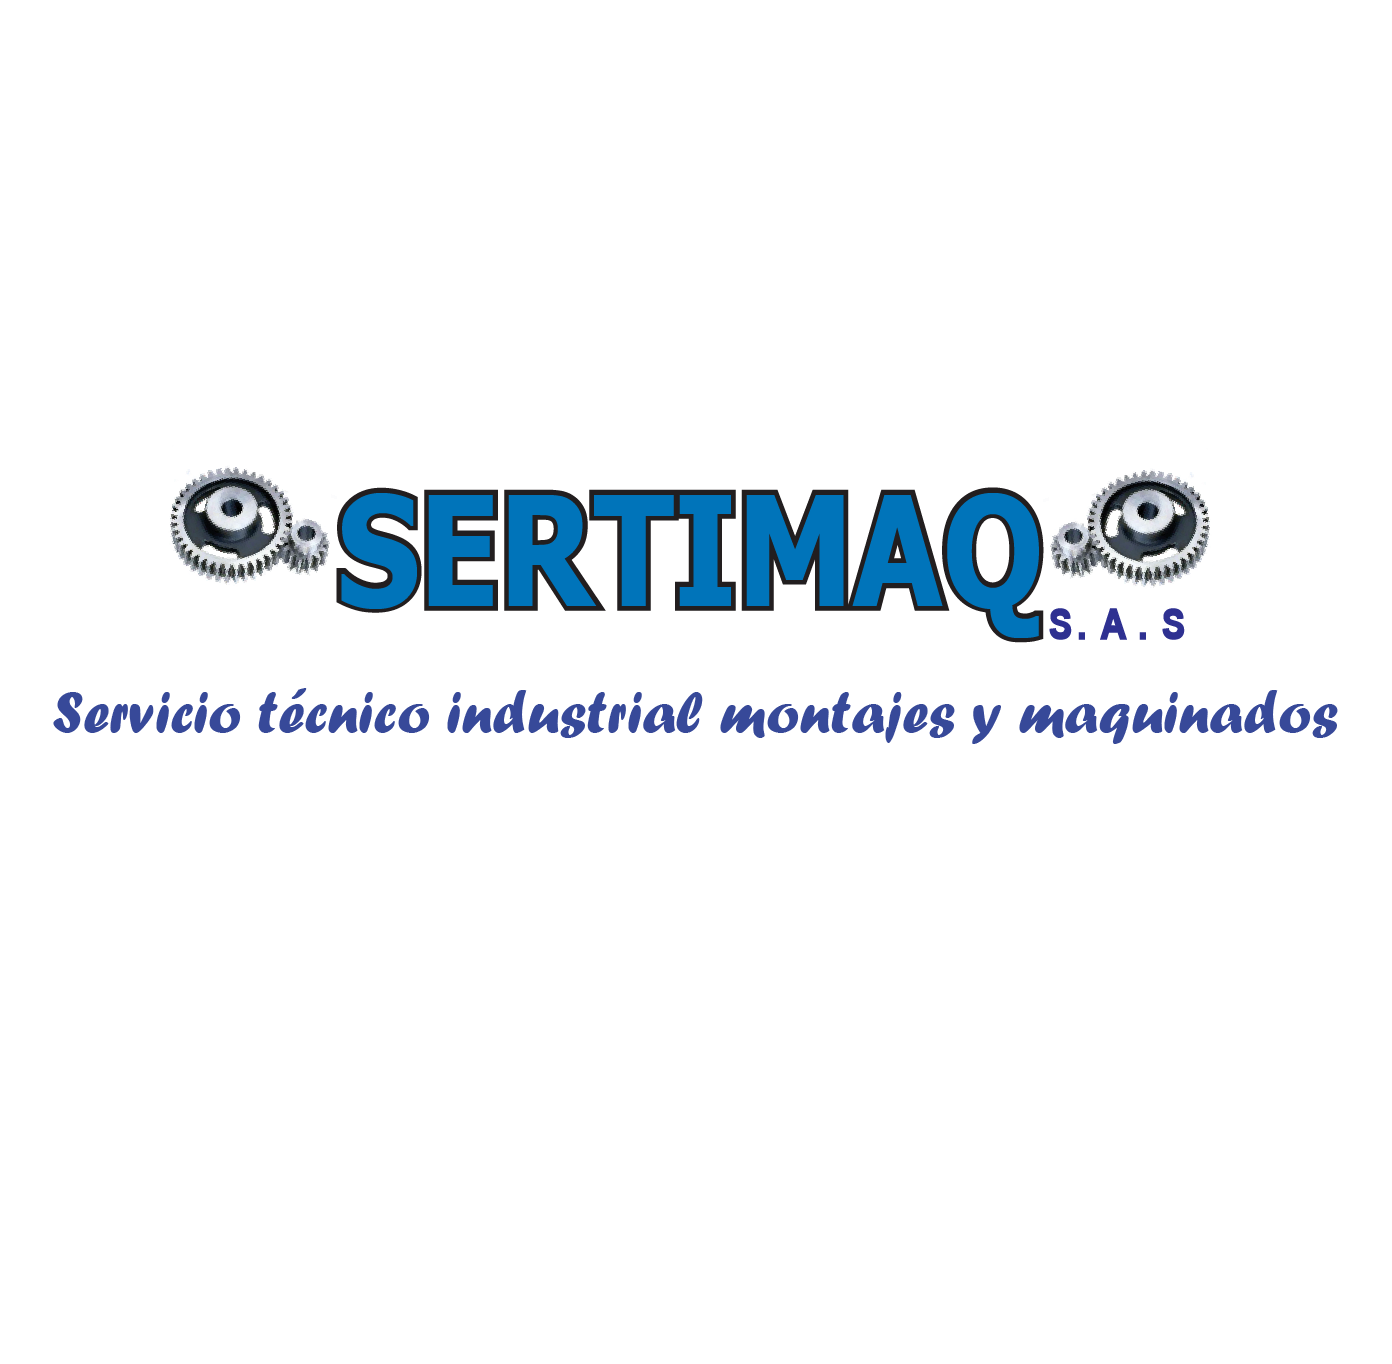 SERTIMAQ S.A.S